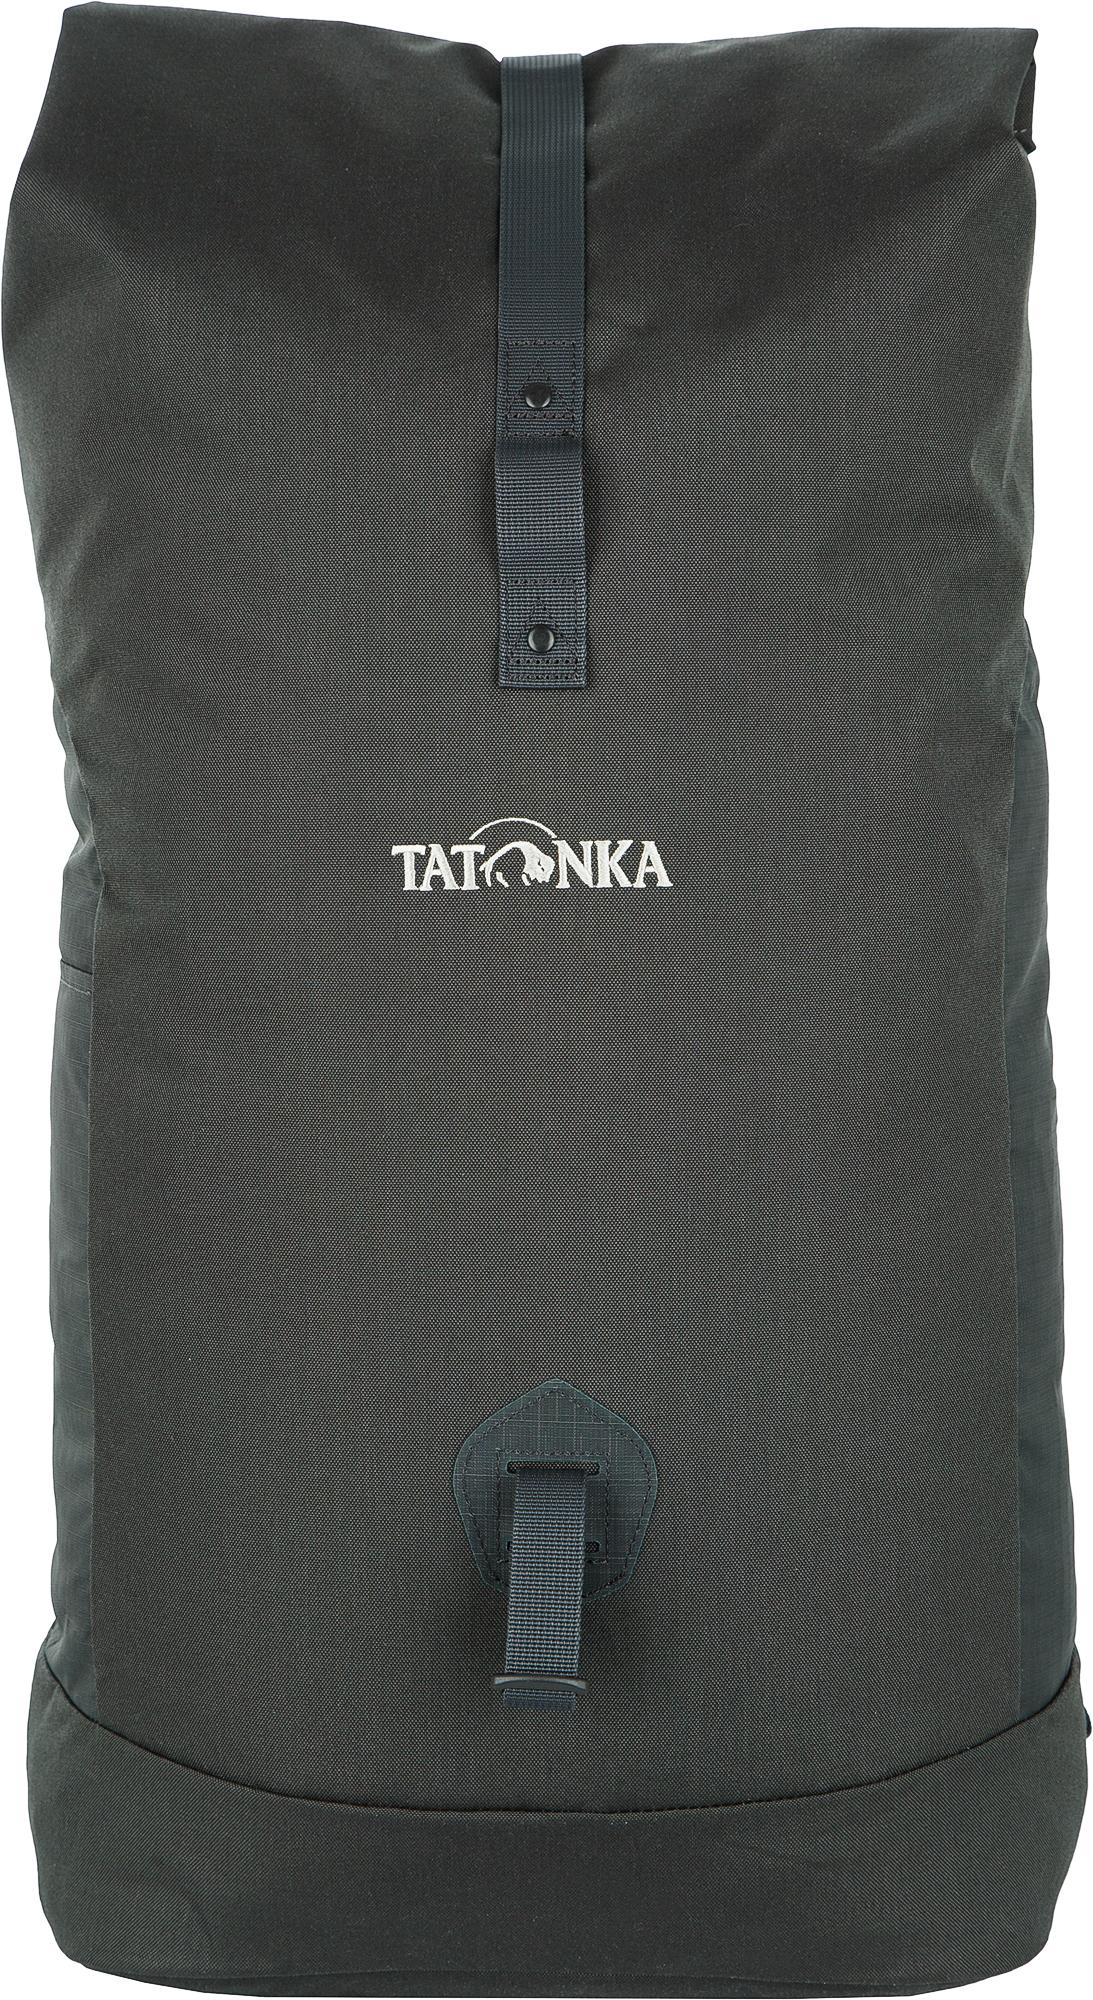 Tatonka Tatonka GRIP ROLLTOP